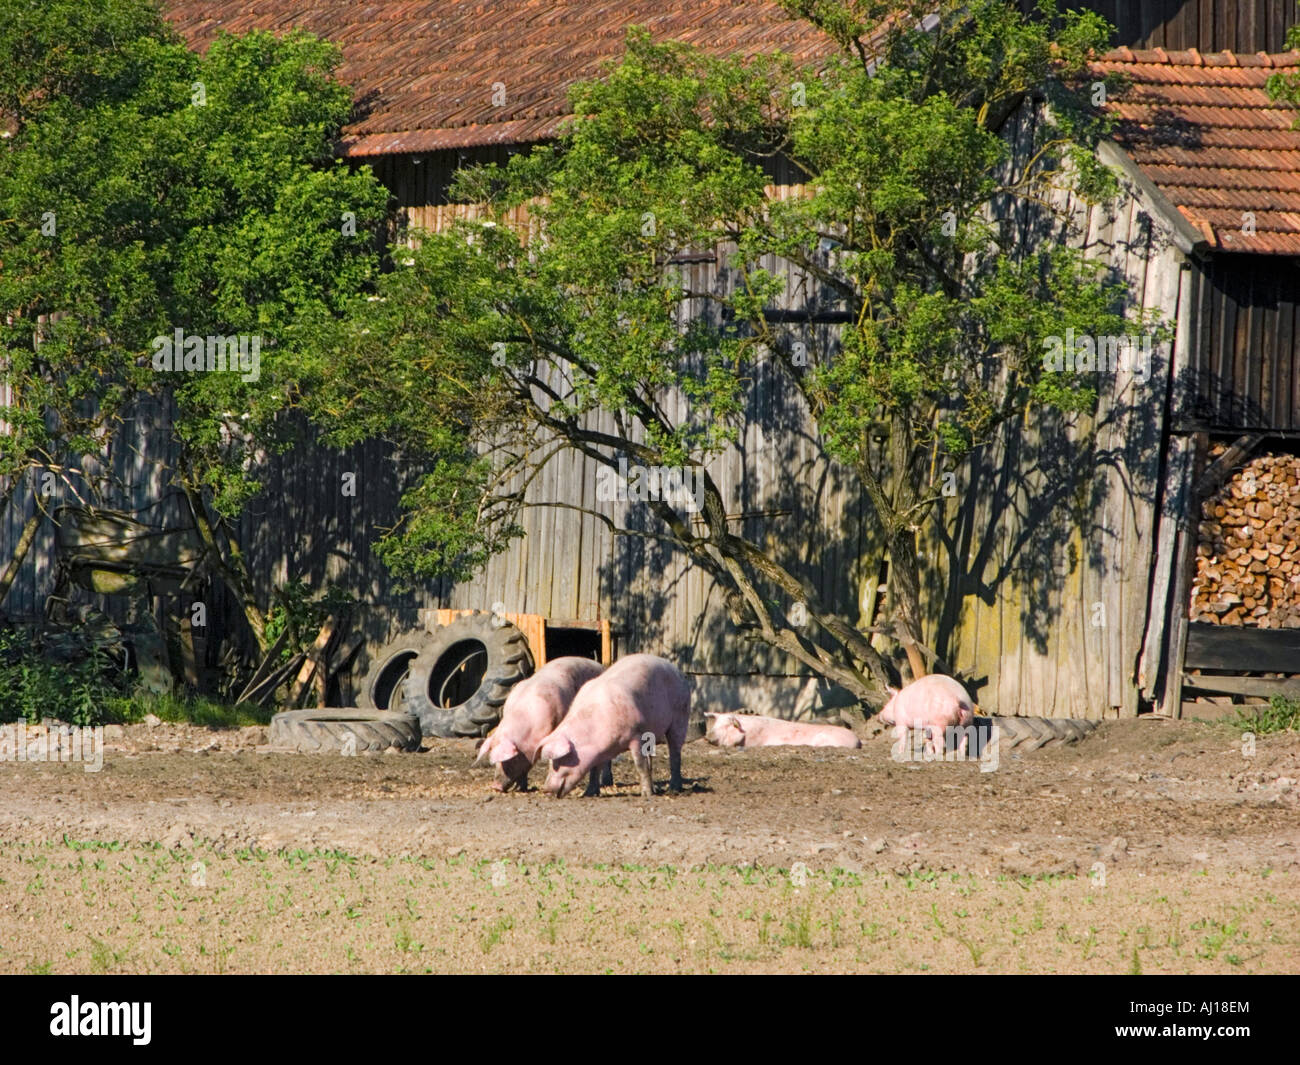 Lucky Bavarian Pig Swine Hog Pork Outdoor Outside German Bavaria Sucking Cage Stable Barn